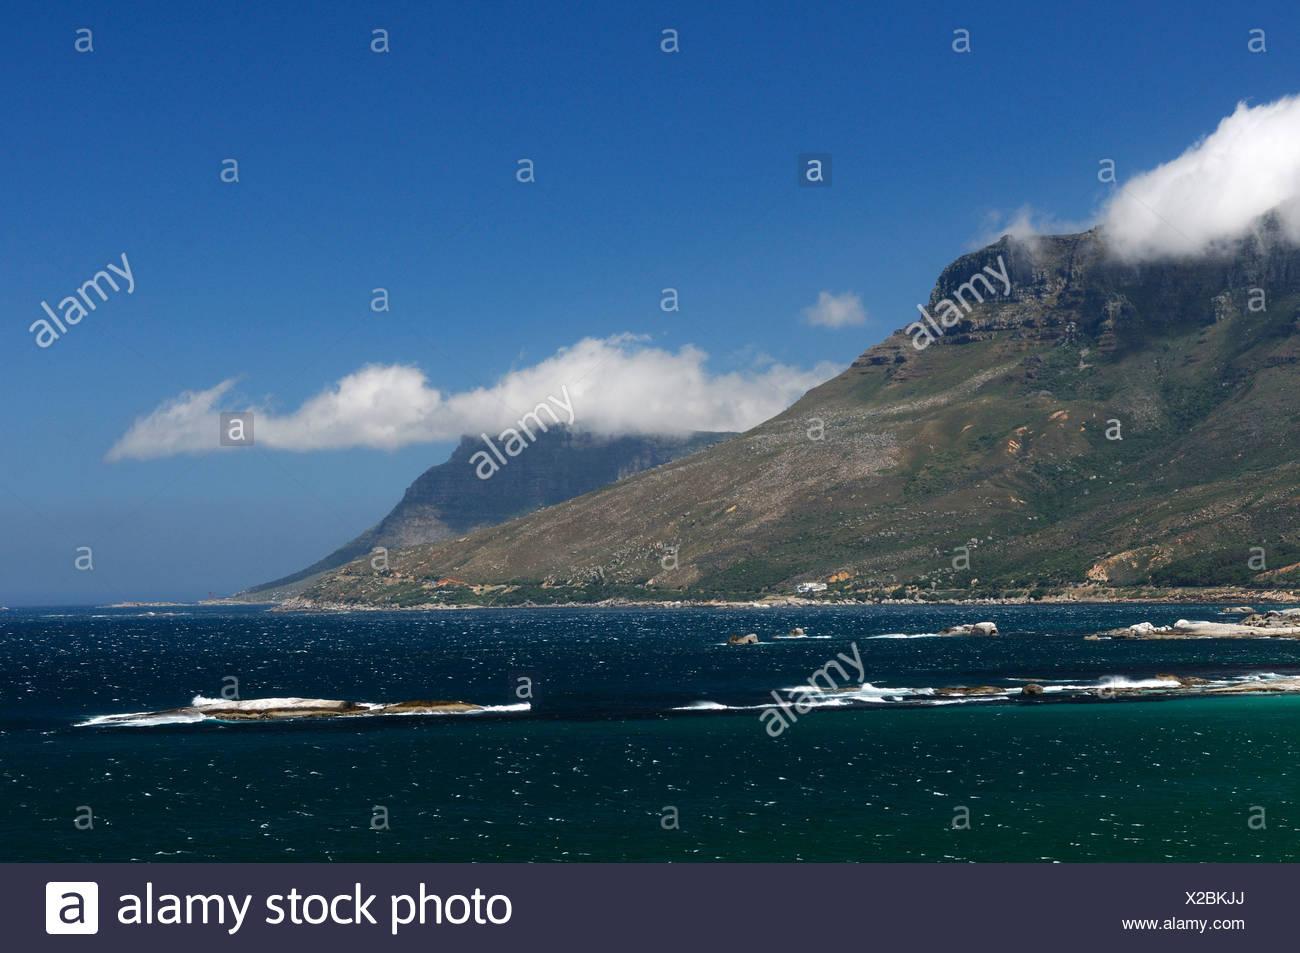 Zwölf Apostel Berge Camps Bay Cape Peninsula Western Cape Südafrika Nebelwolken Ufer Küste Meer Ozean Häuser Landschaft Stockbild